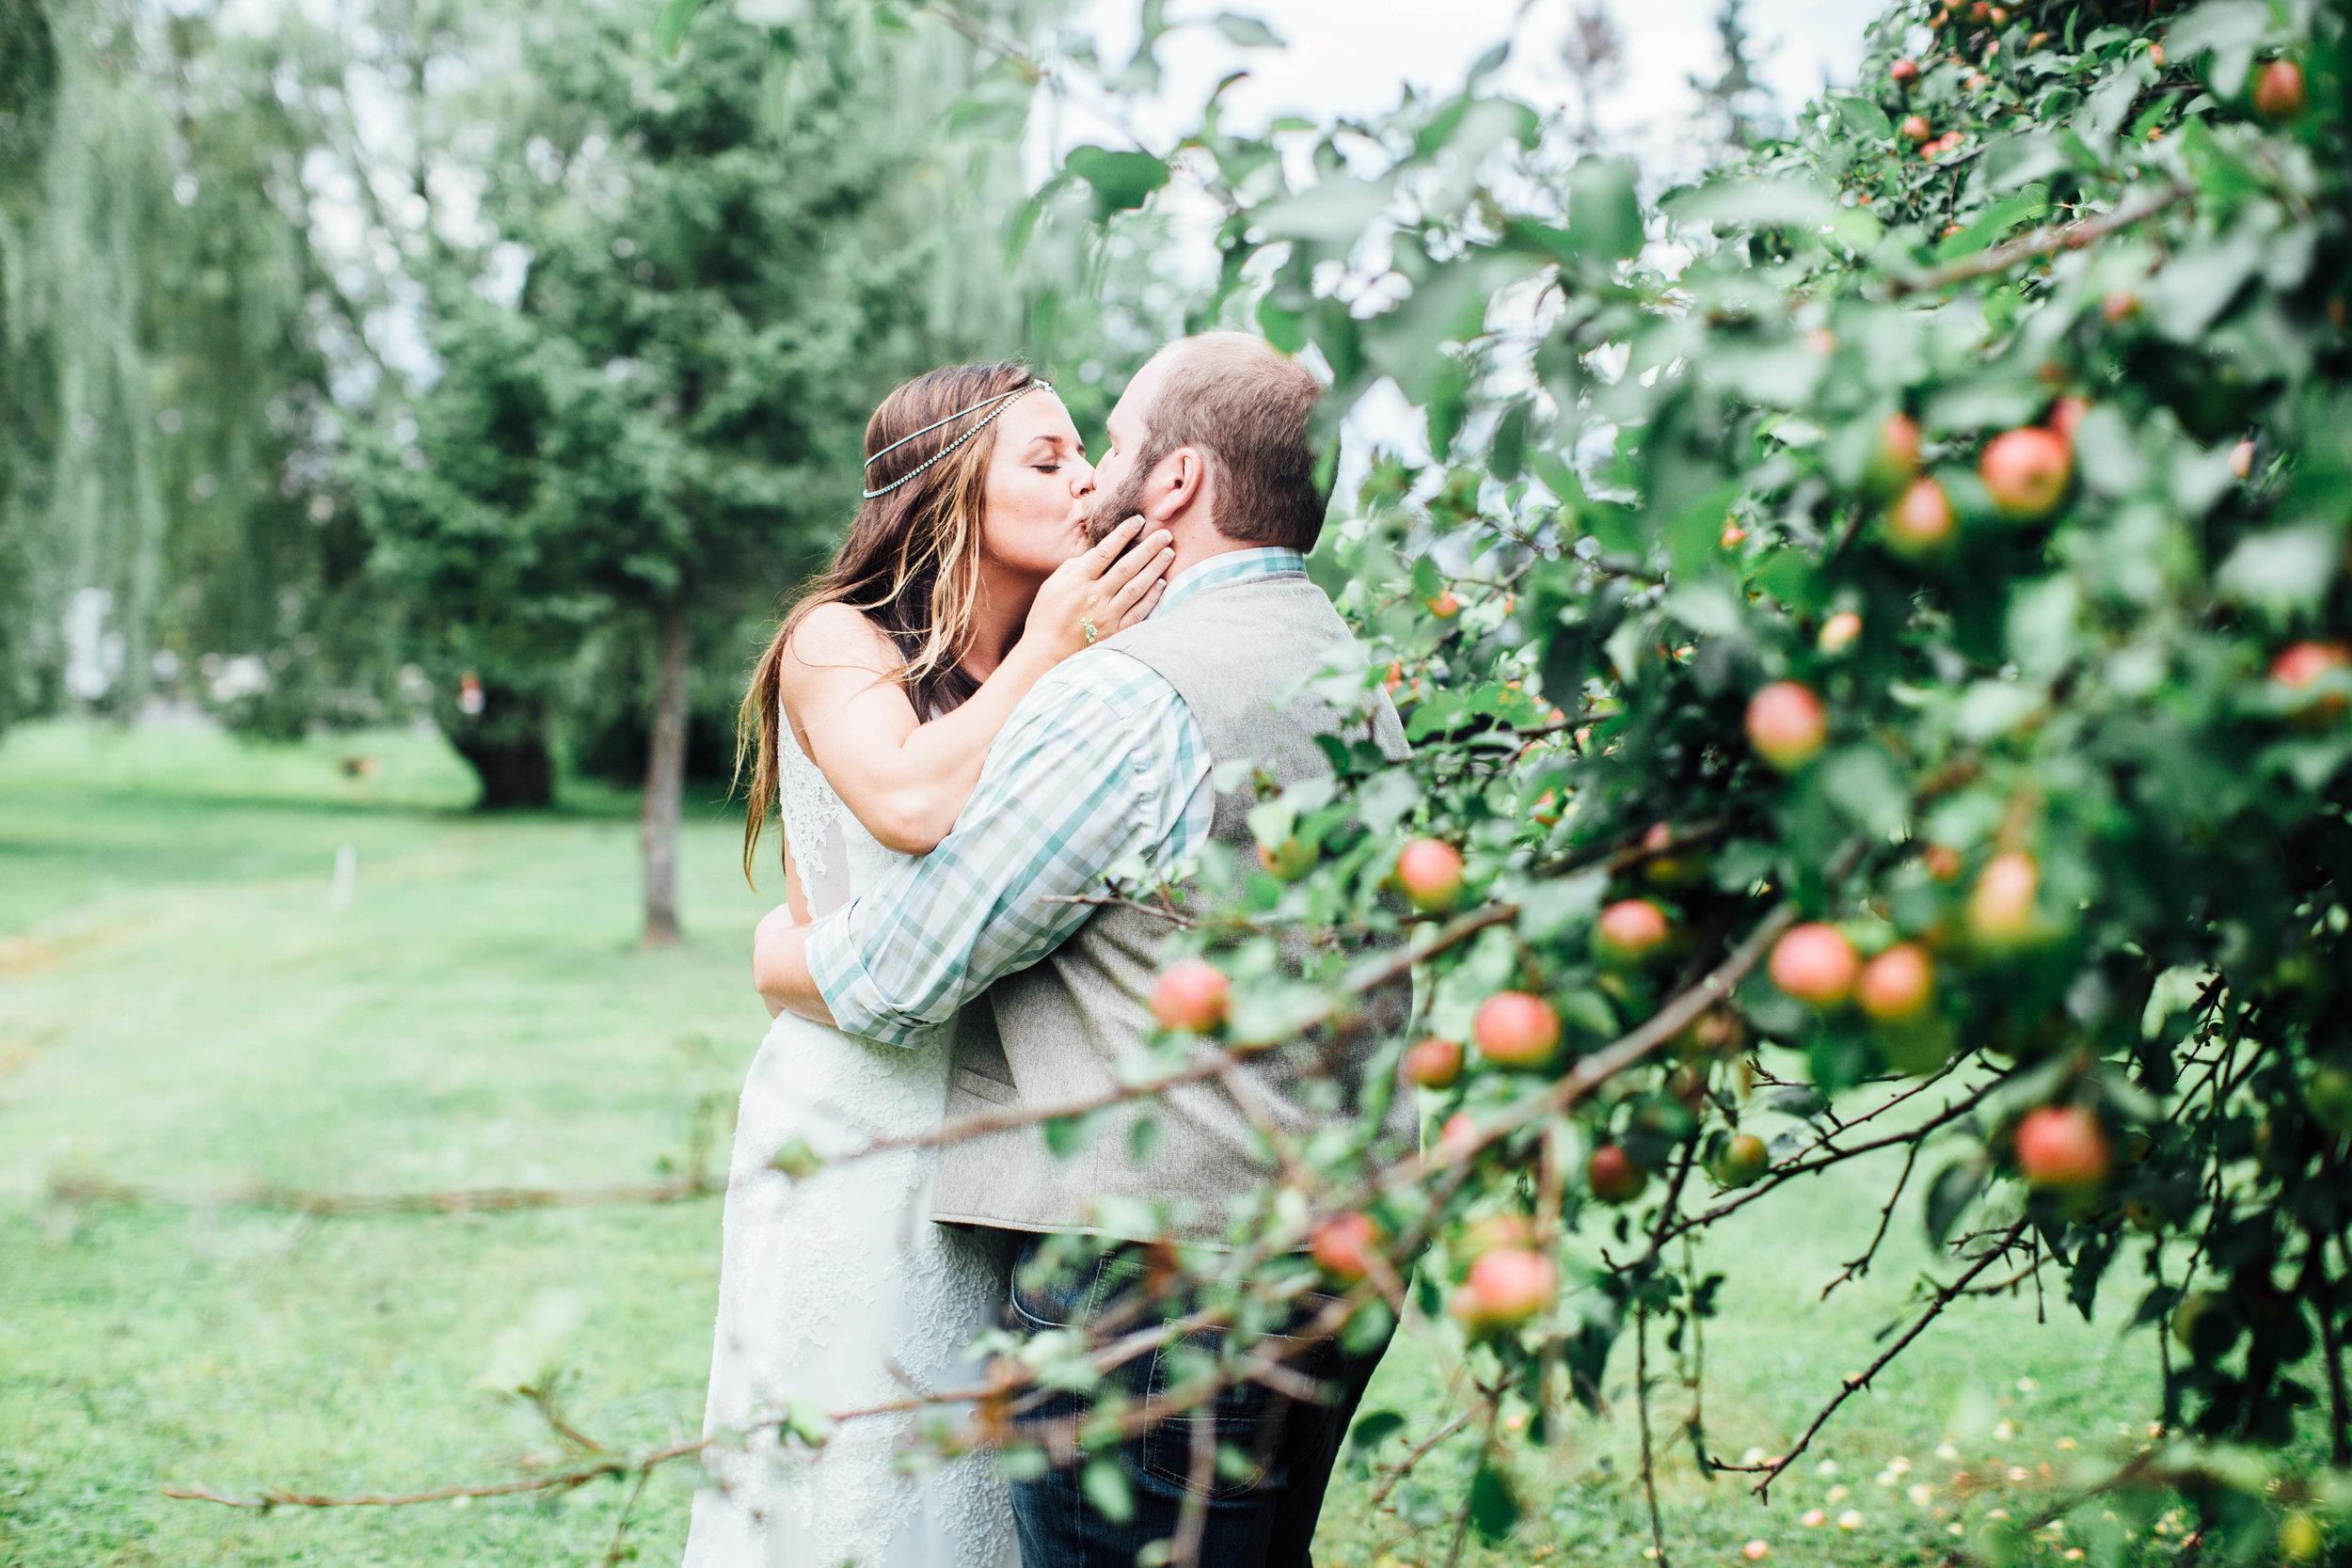 Bohemian Wedding - Sabrina Leigh Studios - Northern Michigan Wedding Photographer109.jpg